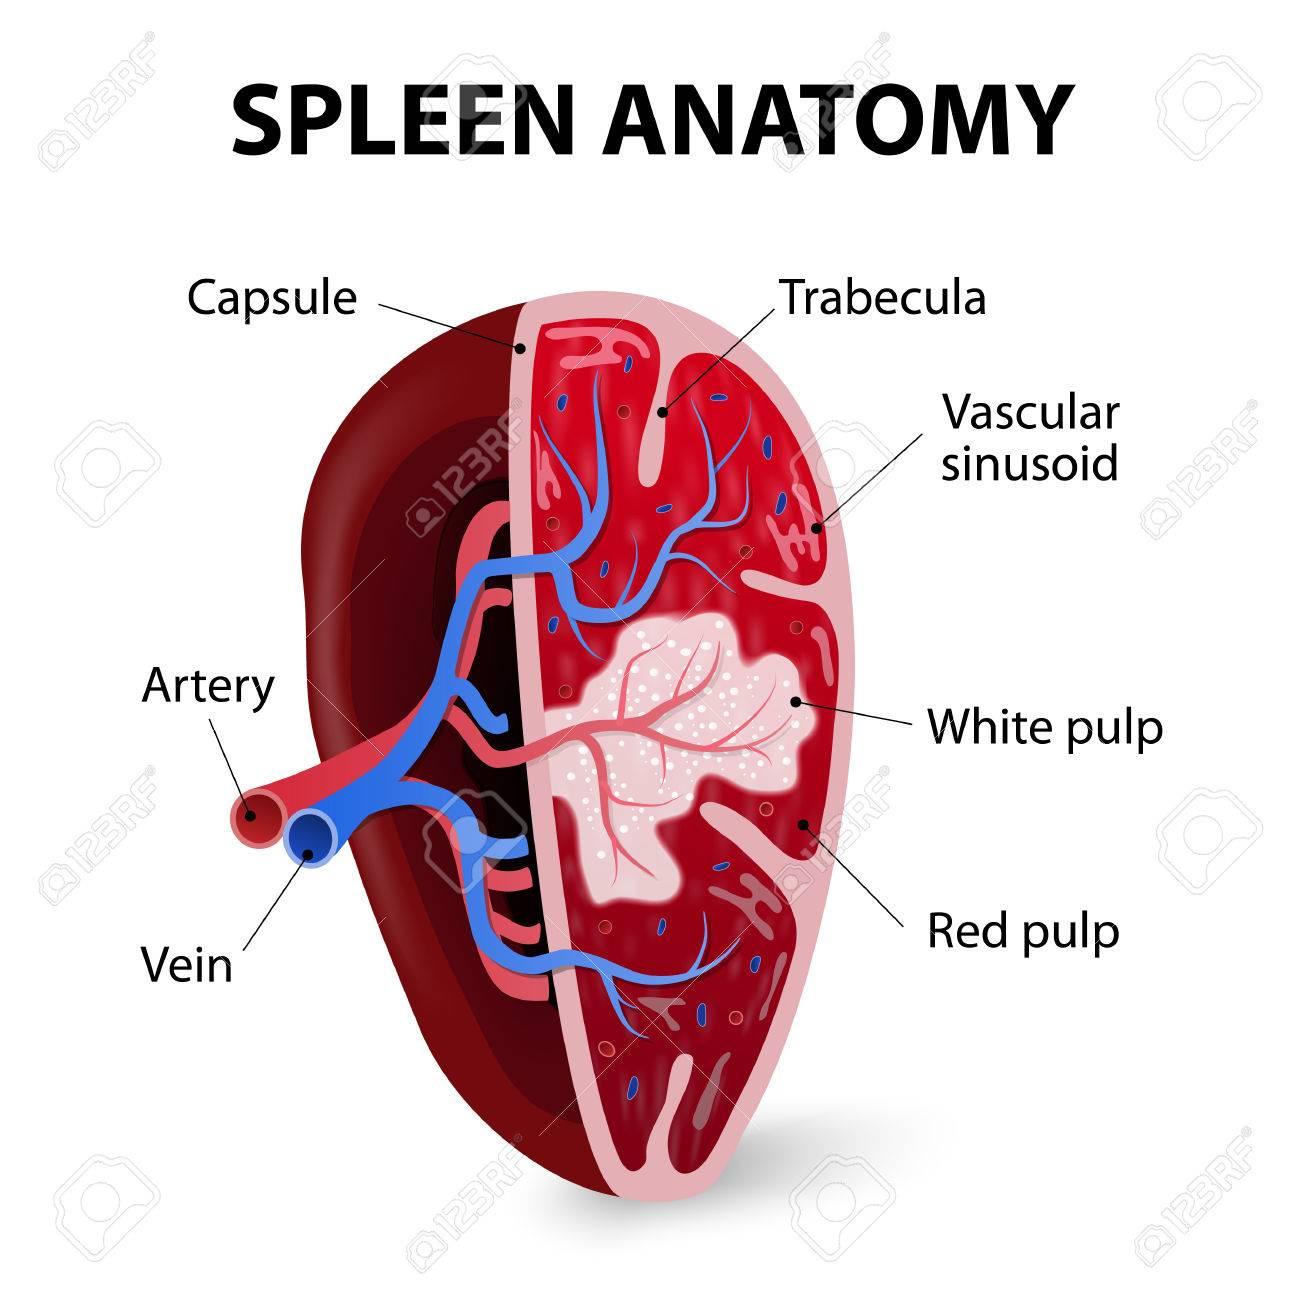 Spleen Cross Section Illustration Showing The Trabecular Tissue